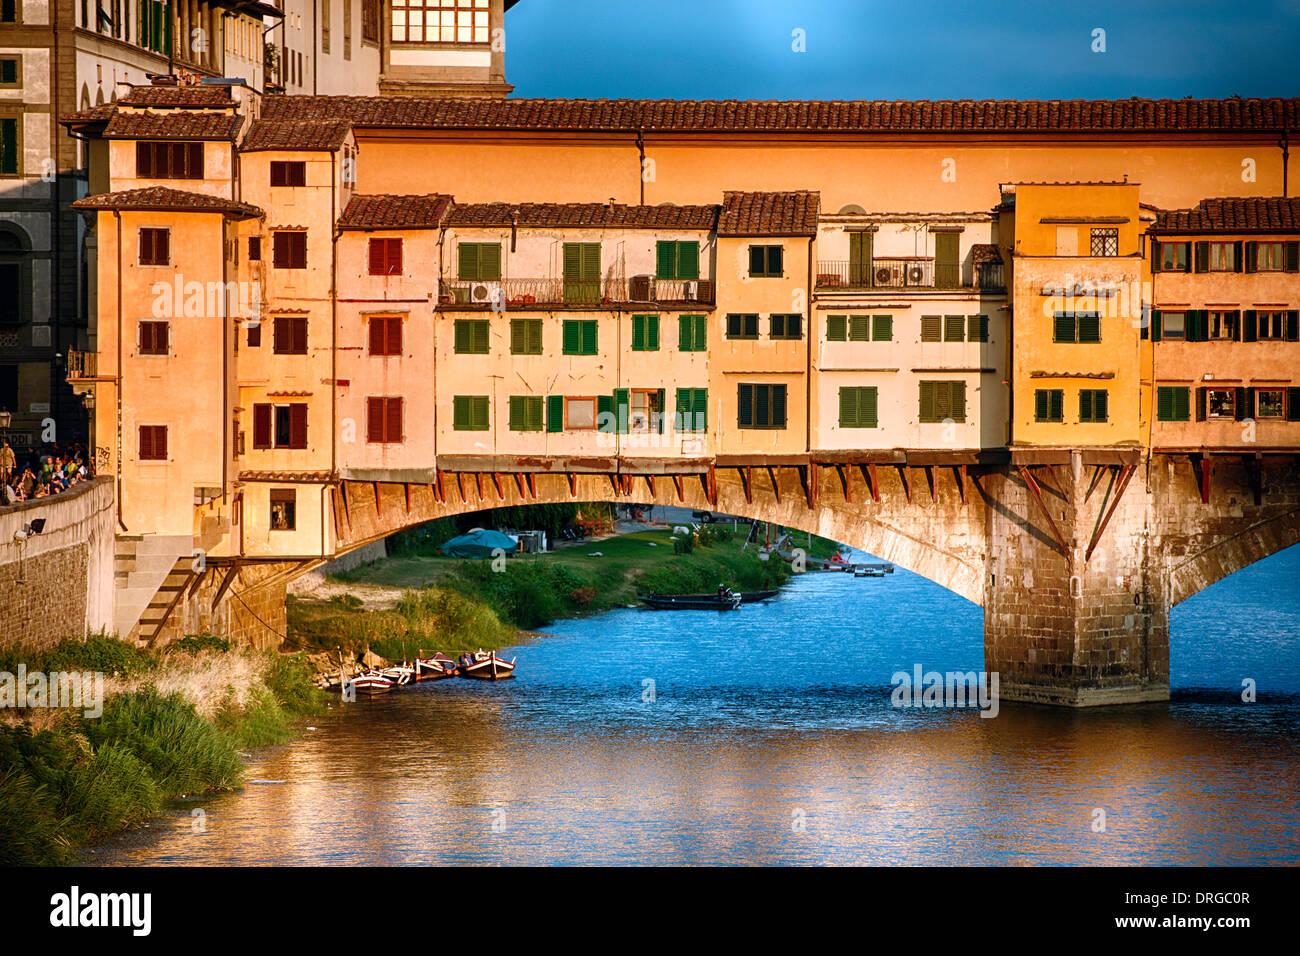 Nahaufnahme des Ponte Vecchio über den Arno Fluss bei Sonnenuntergang, Florenz, Toskana, Italien Stockbild